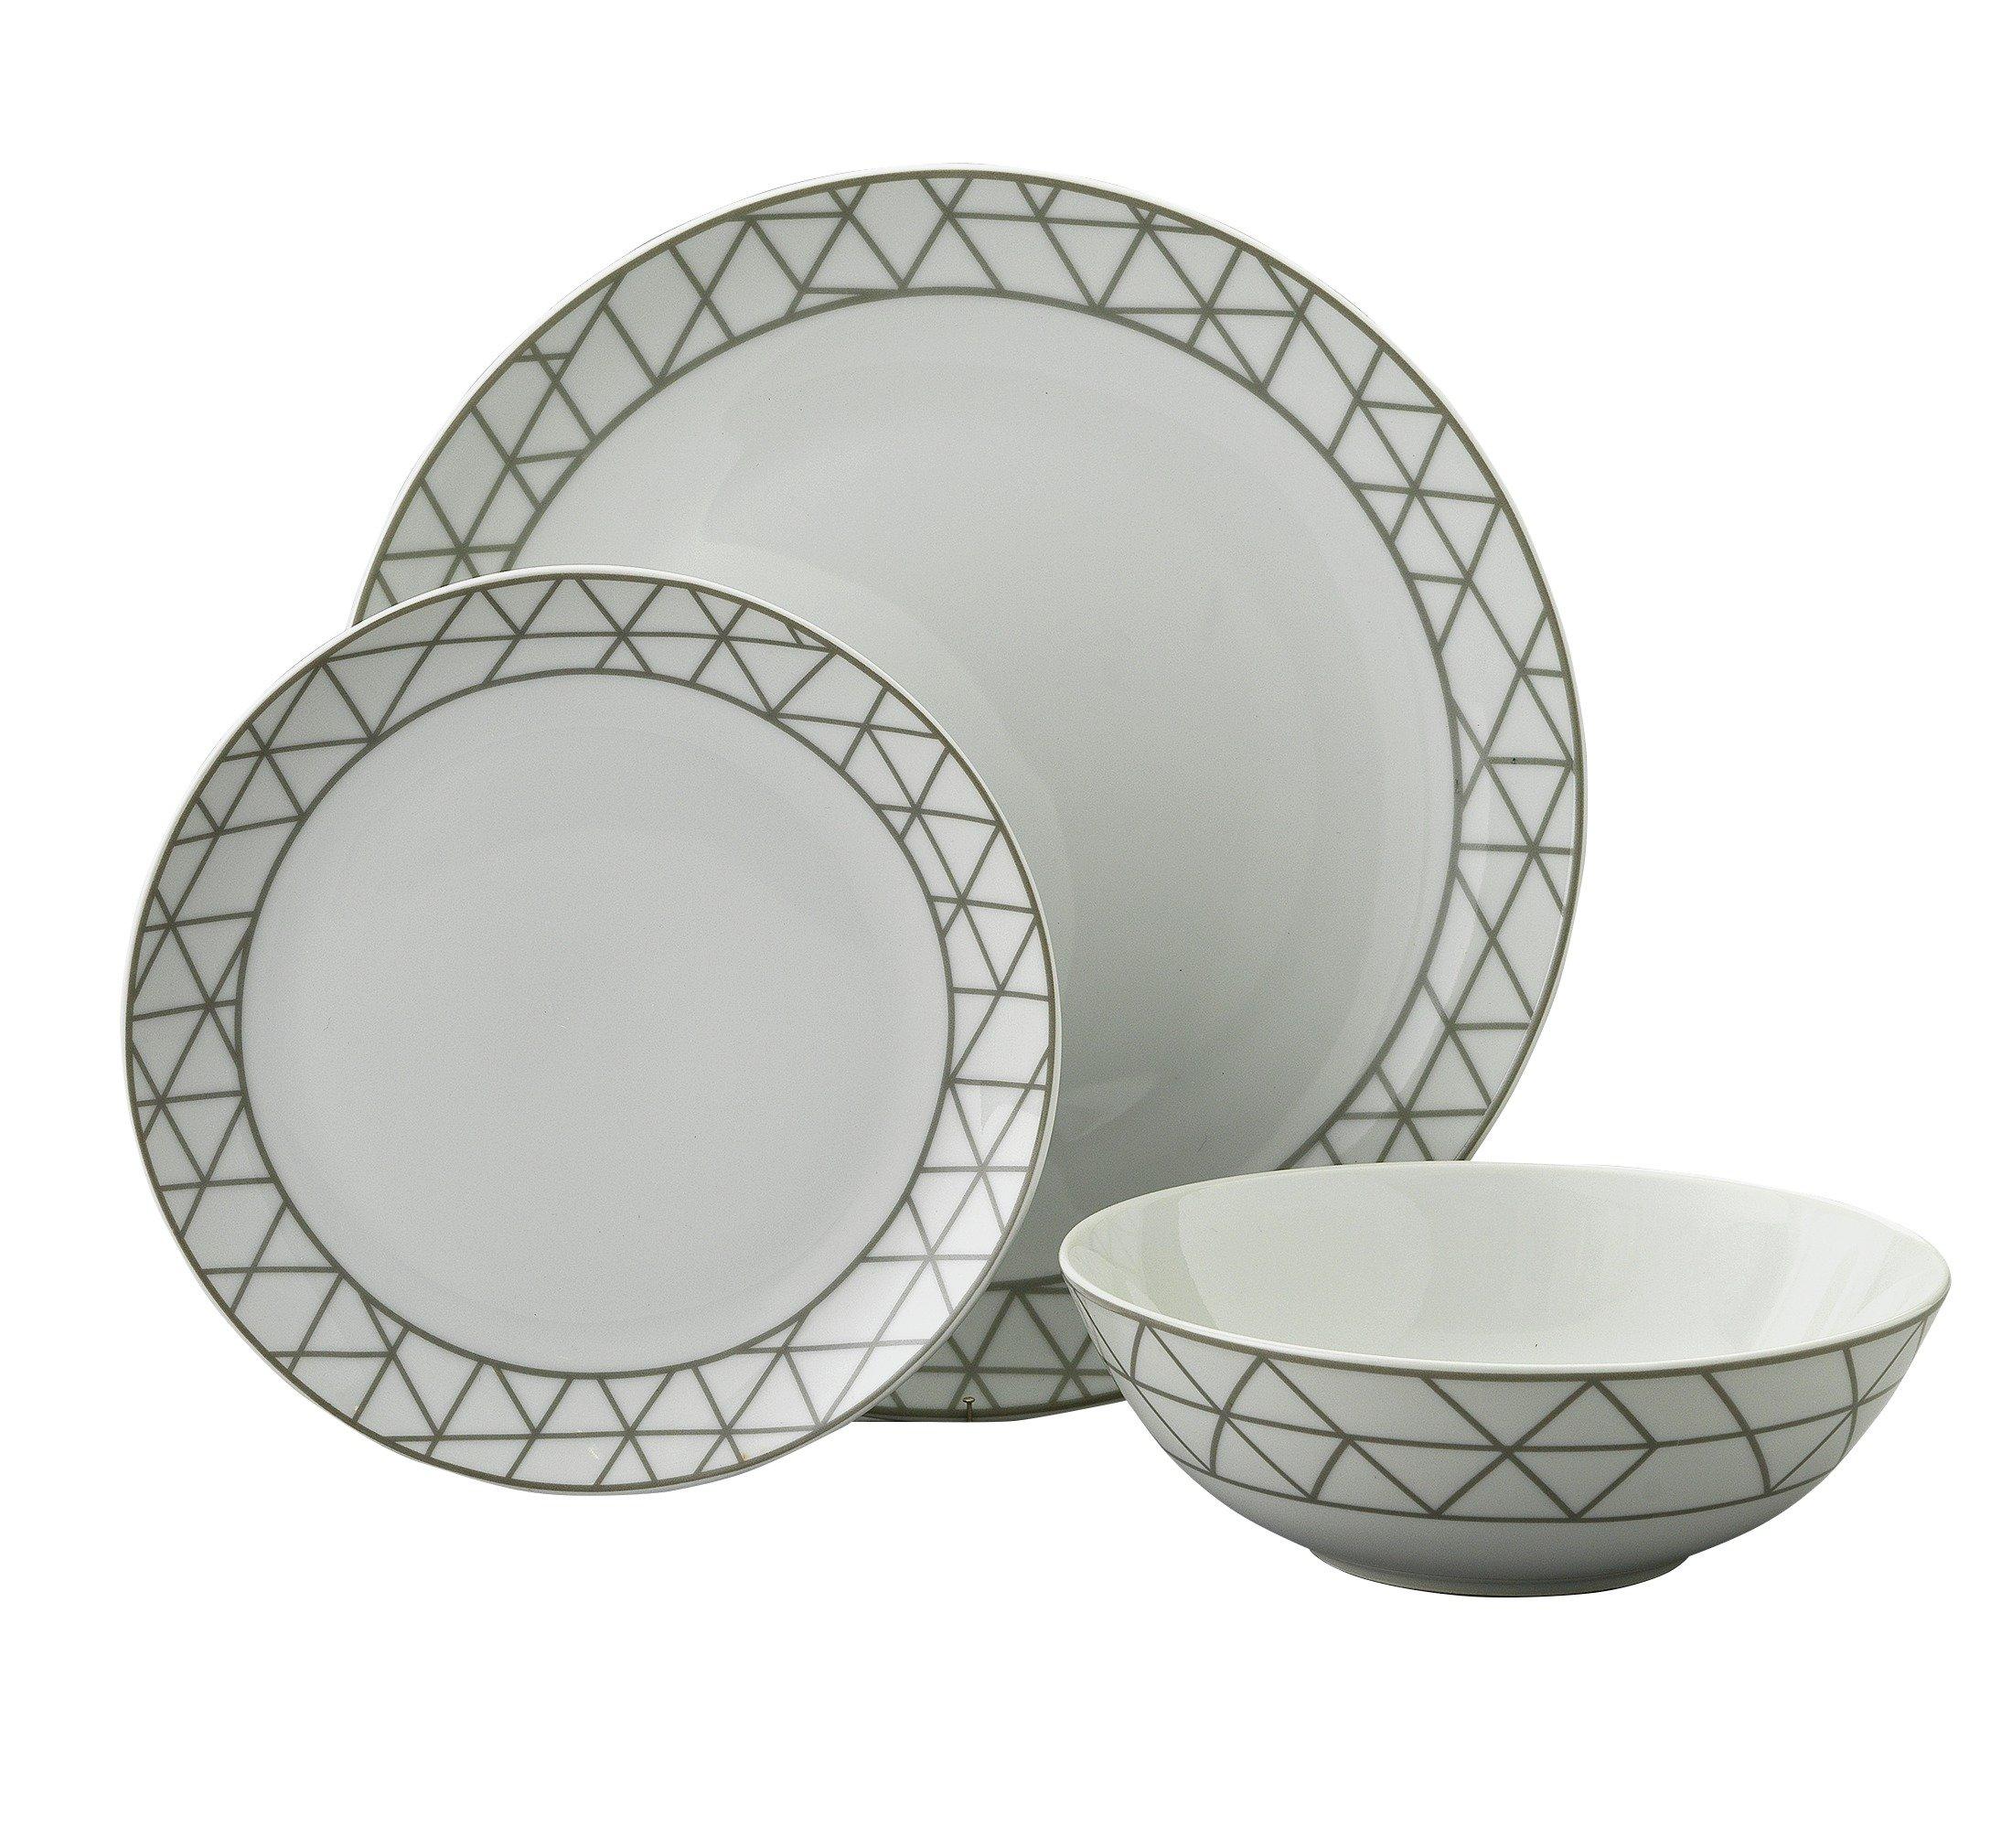 Argos Home 12 Piece Grey Geometric Porcelain Dinner Set